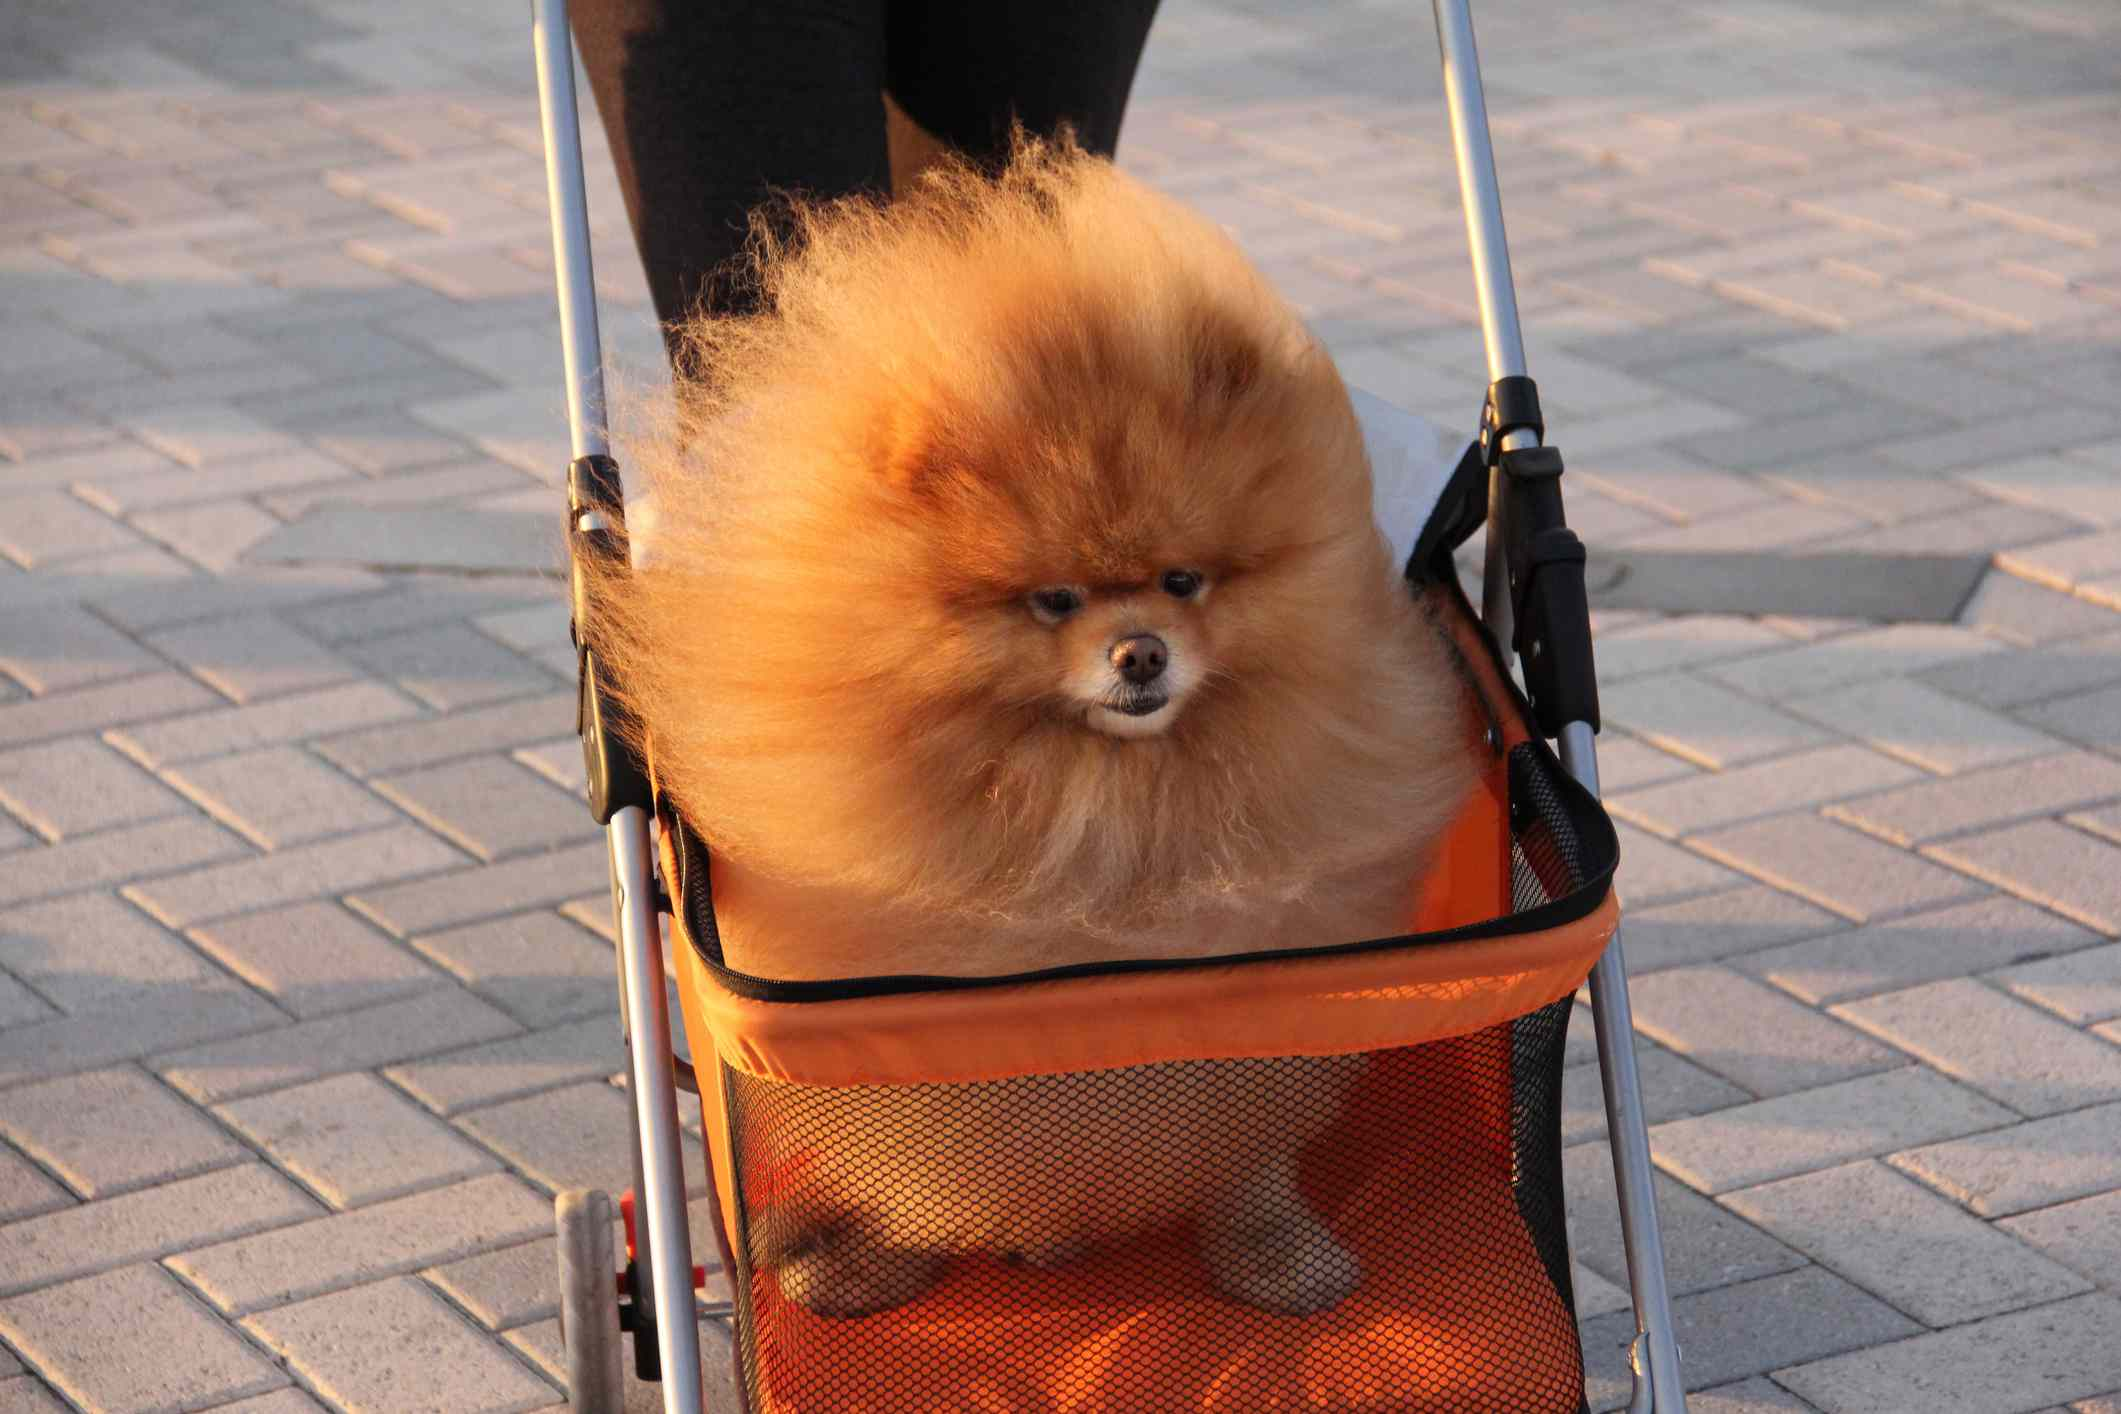 Red Pomeranian in dog stroller